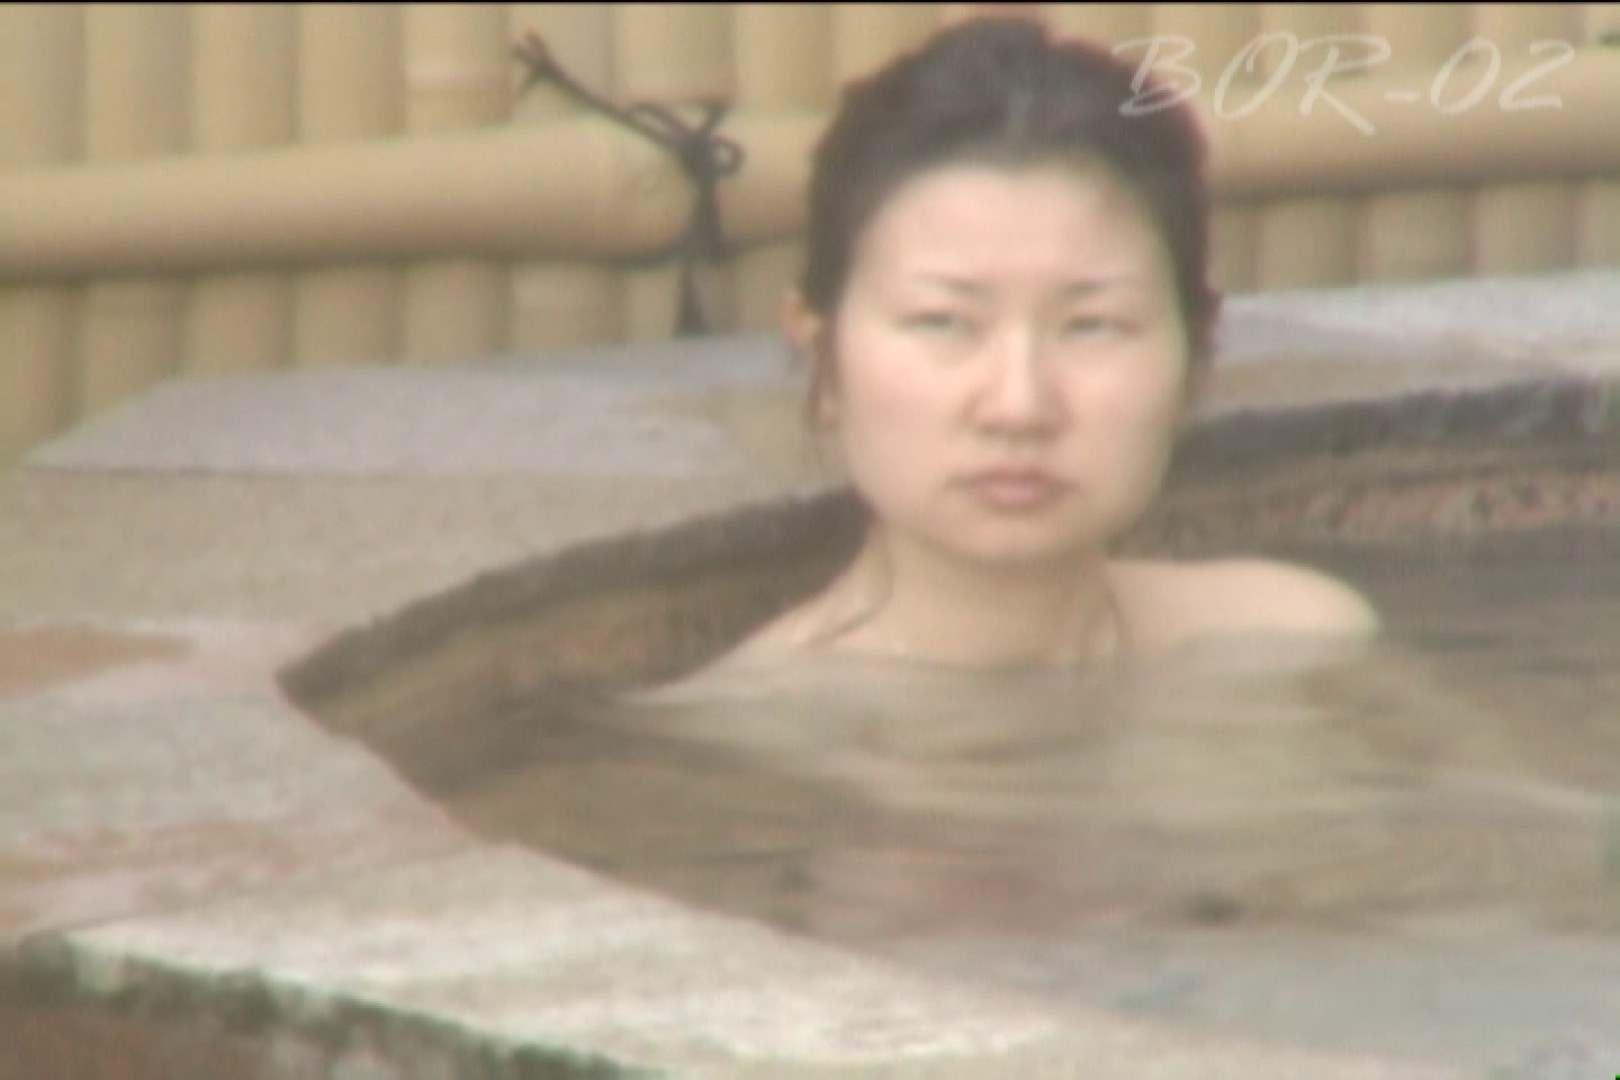 Aquaな露天風呂Vol.476 盗撮 濡れ場動画紹介 80画像 17